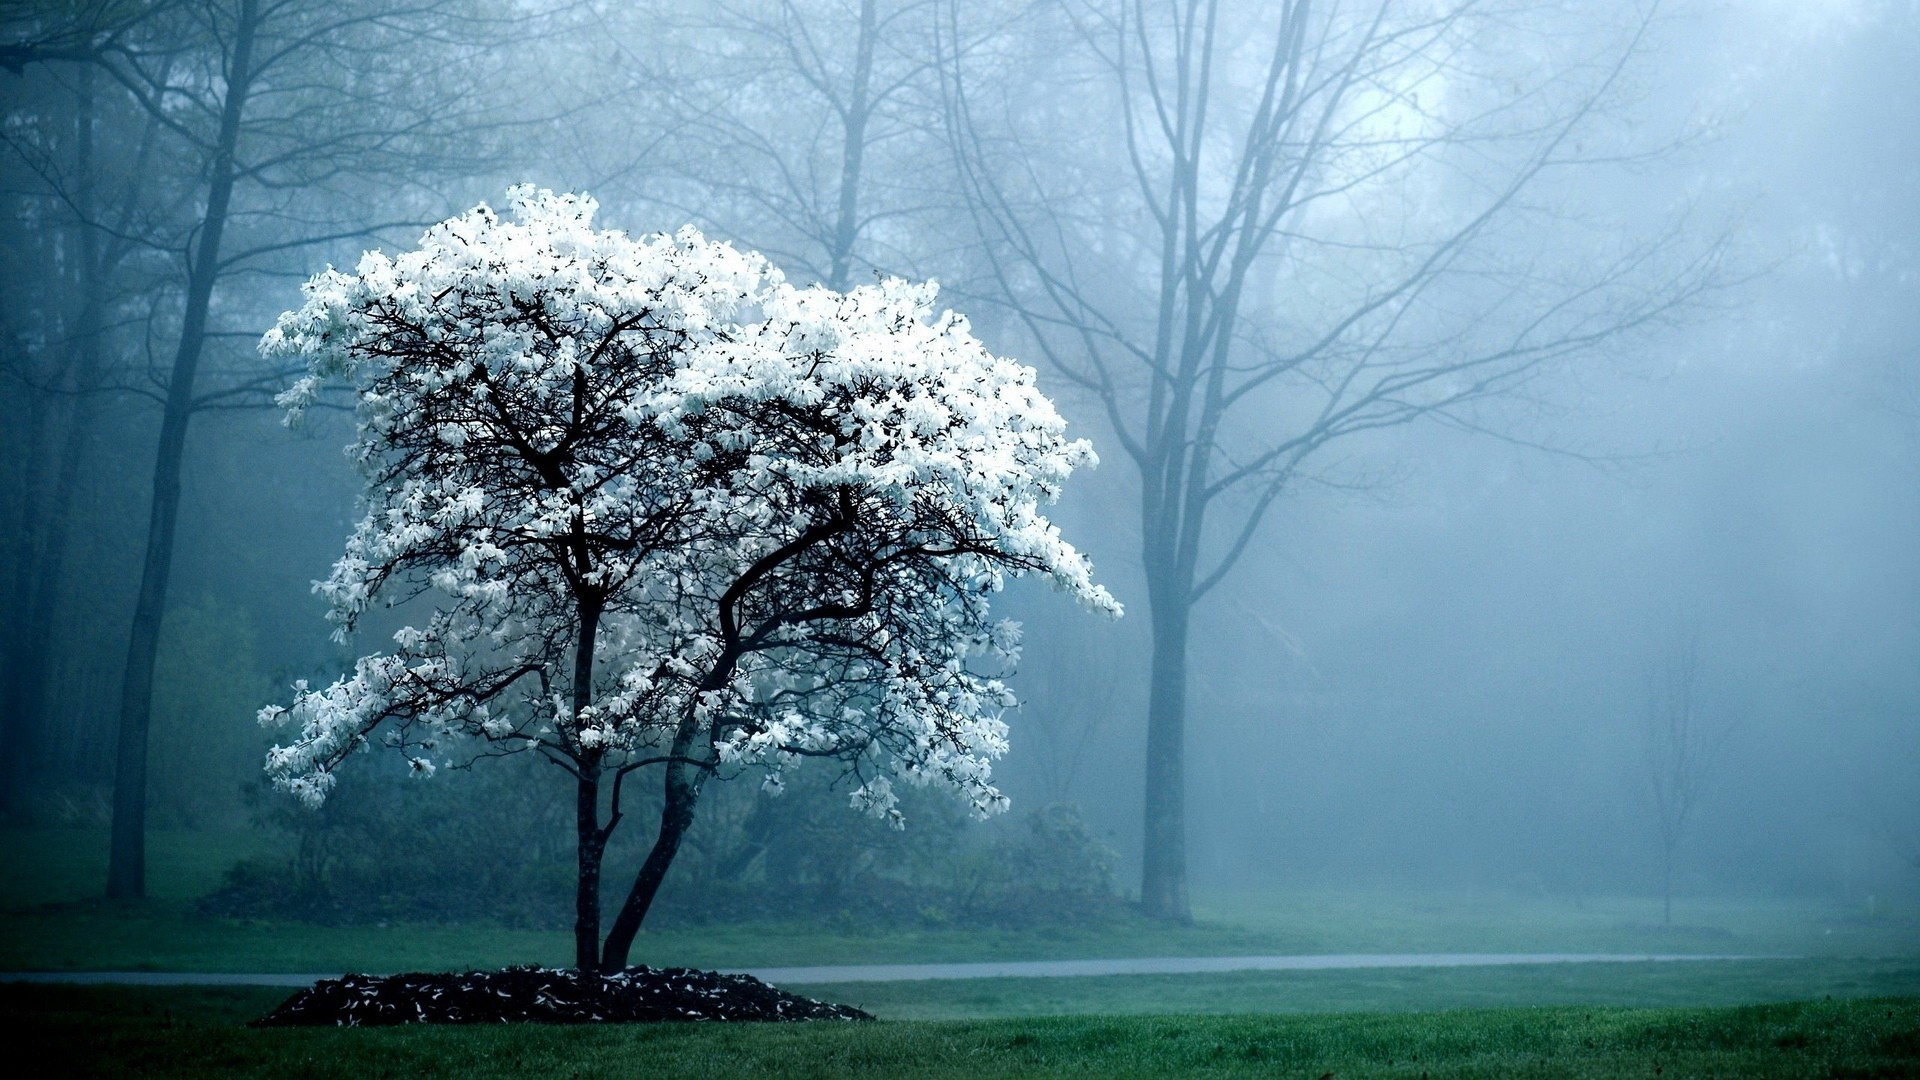 fog wallpaper download